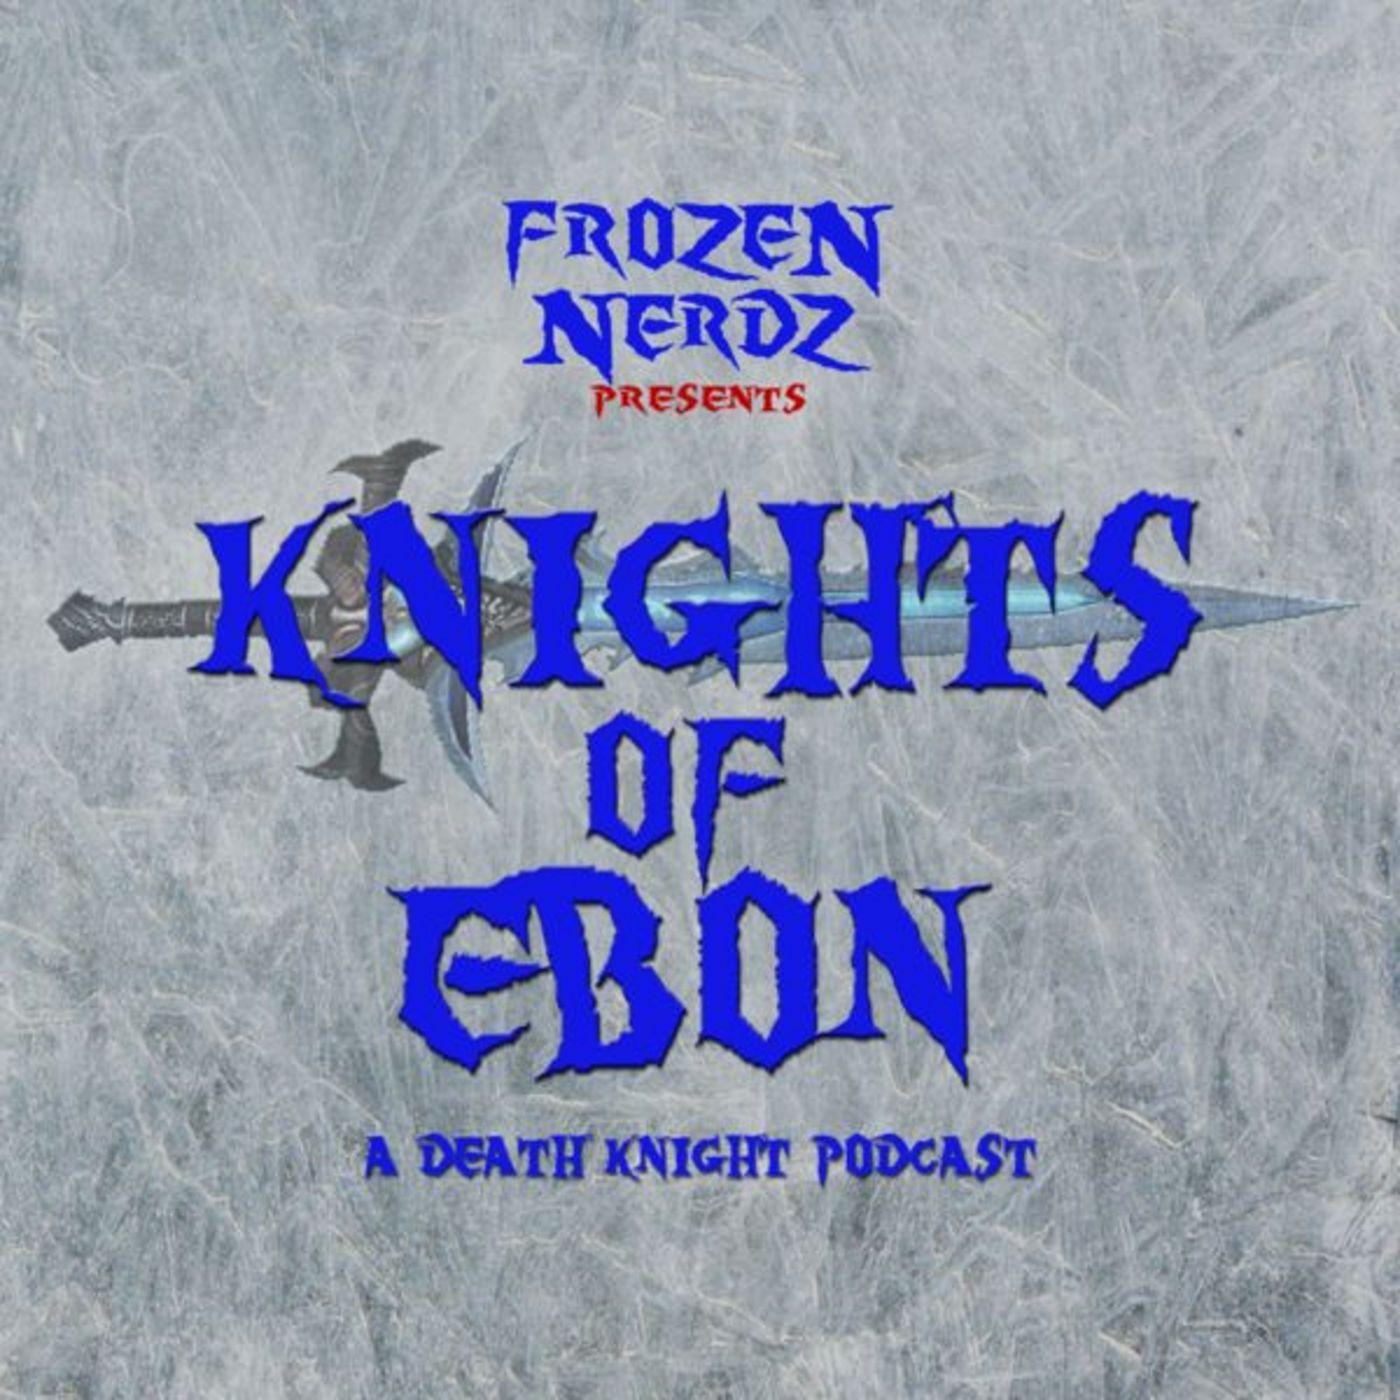 <![CDATA[Knights of Ebon - A World of Warcraft Death Knight Podcast]]>